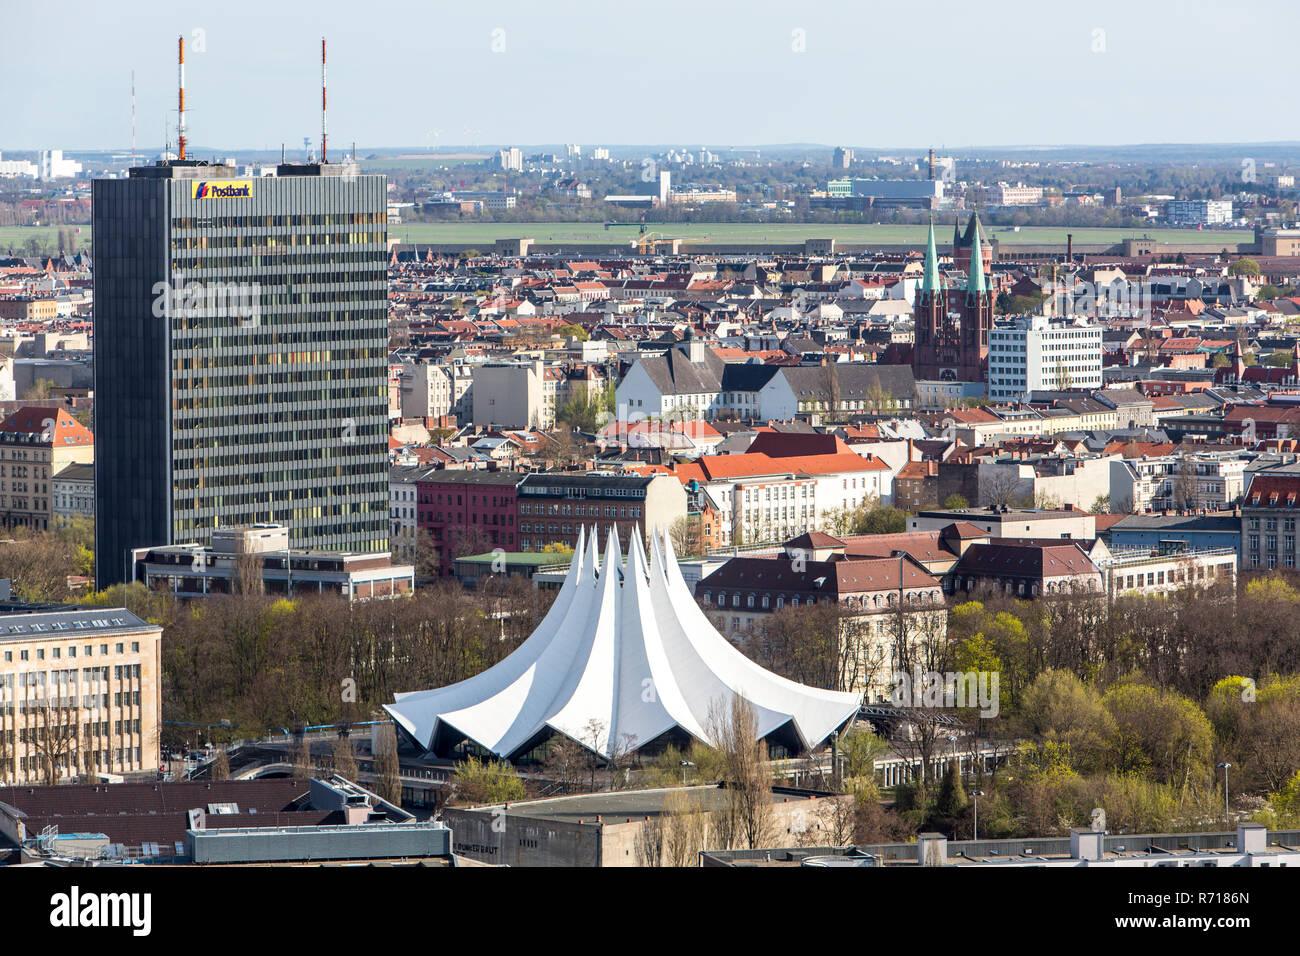 Cityscape, Berlin-Kreuzberg, Tempelhof Park and Tempodrom, Berlin, Germany - Stock Image